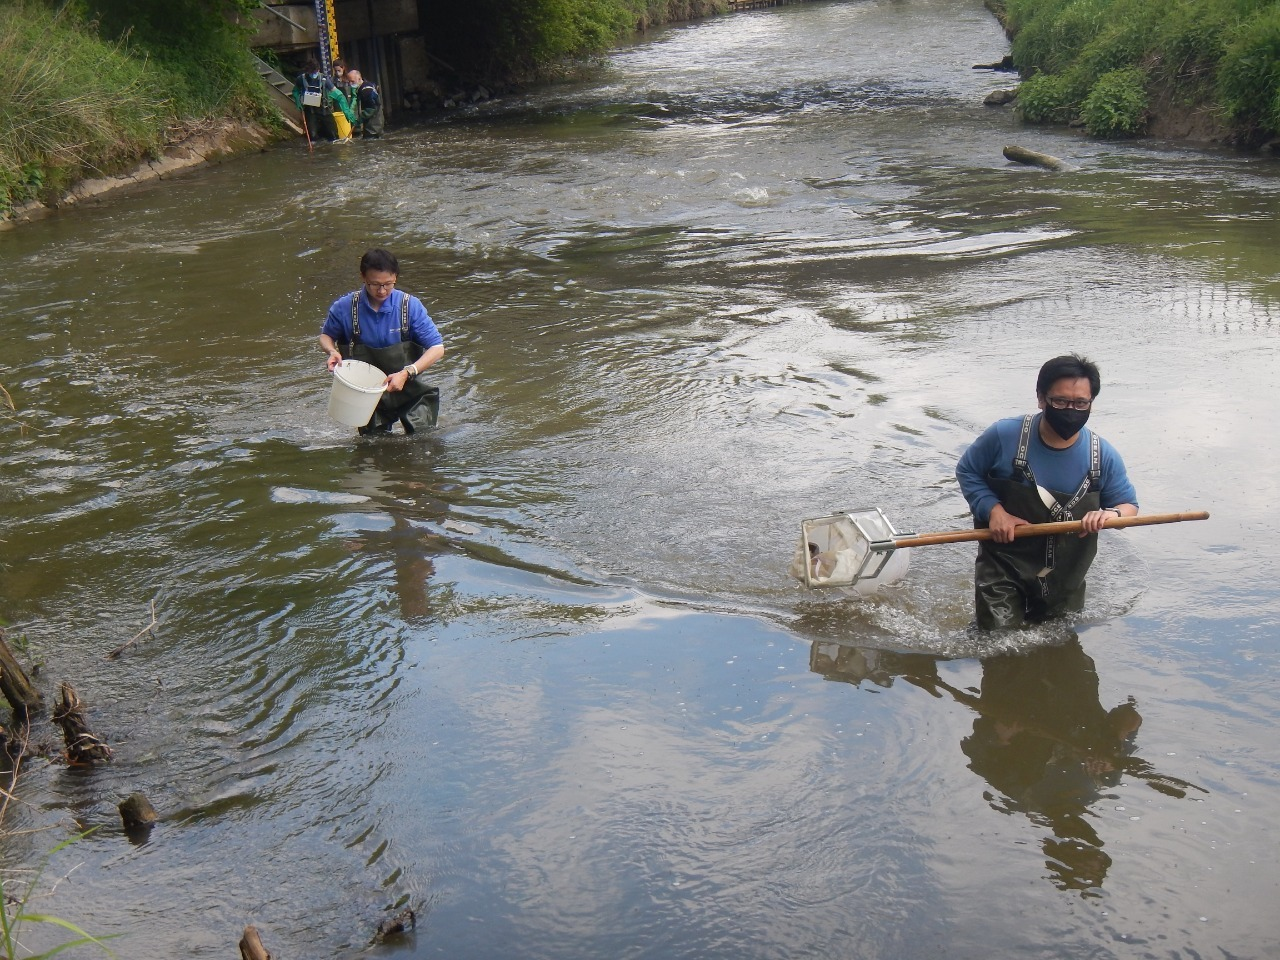 Ronald (right) Kick-sampling for macro-invertebrates in the Dijle river, May 2021 © SUSDEV